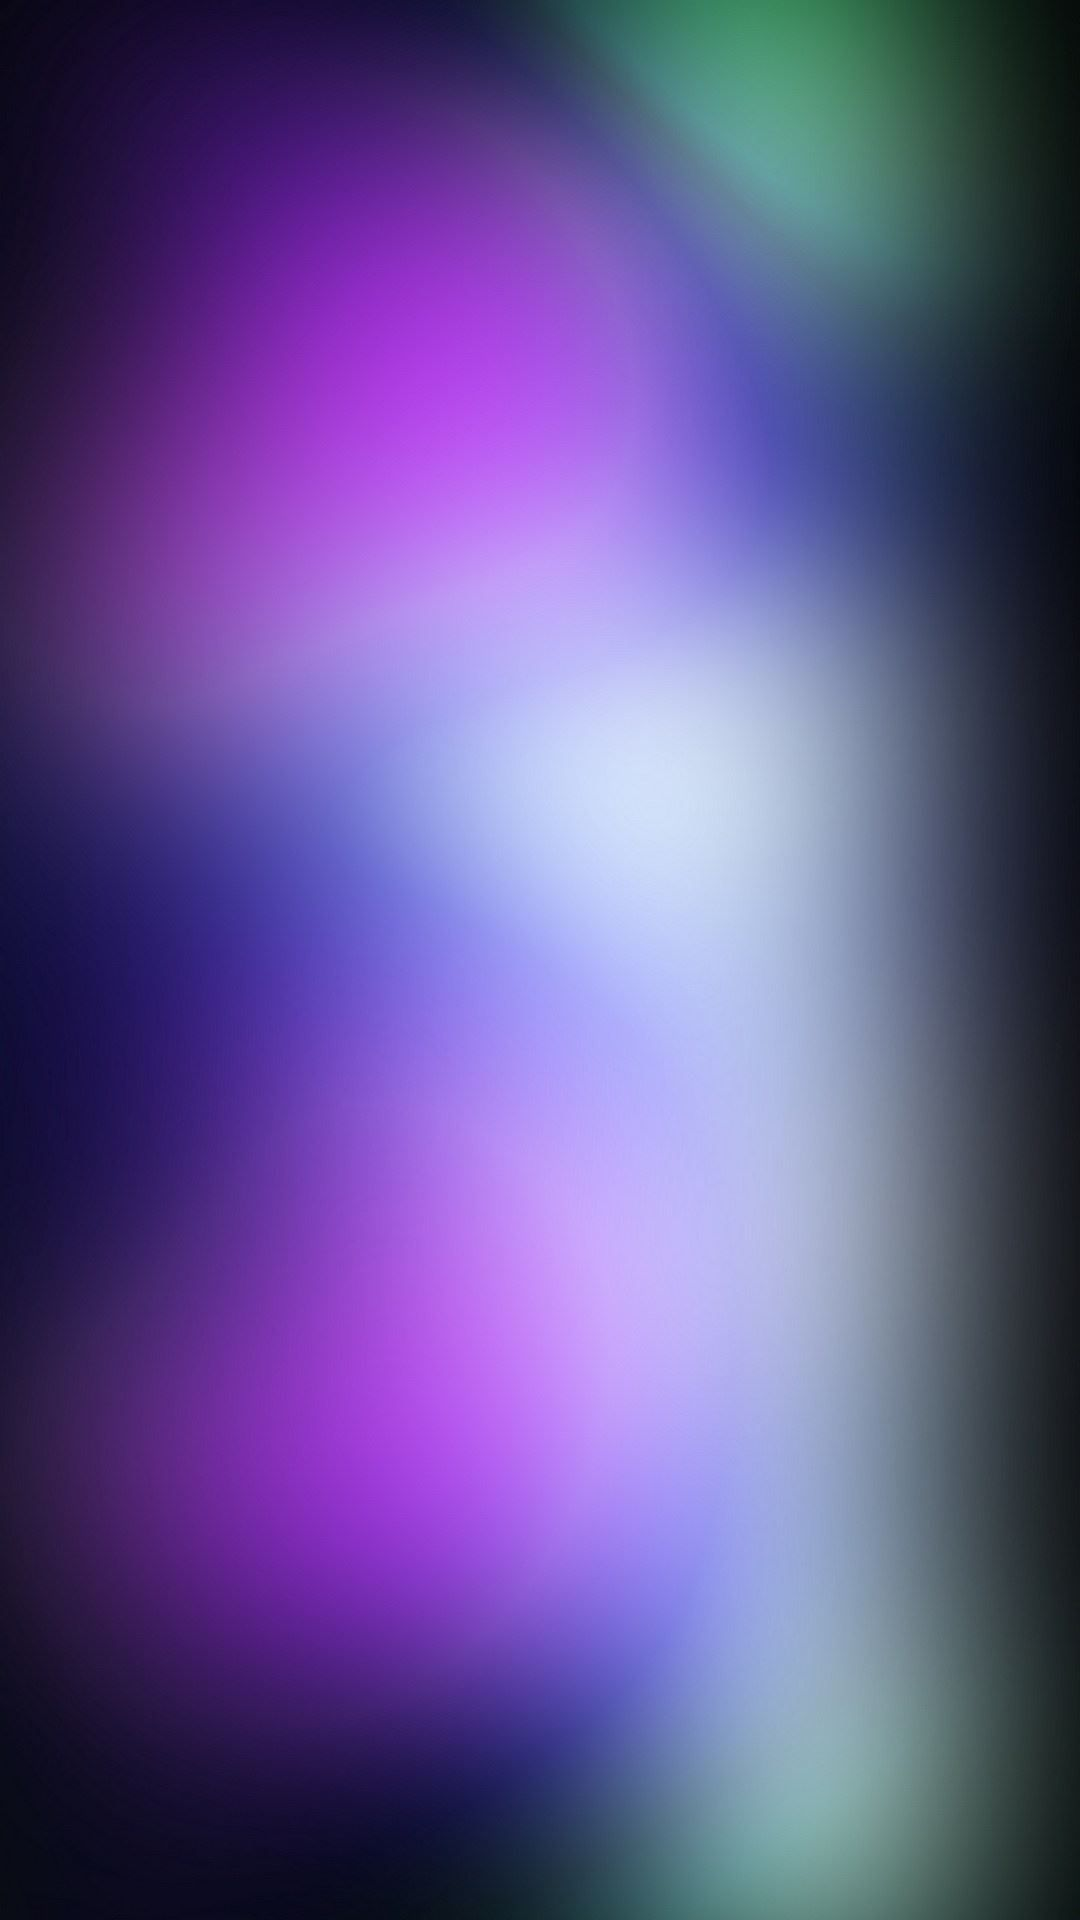 Electric Blue Purple Blur iPhone 6 Plus HD Wallpaper